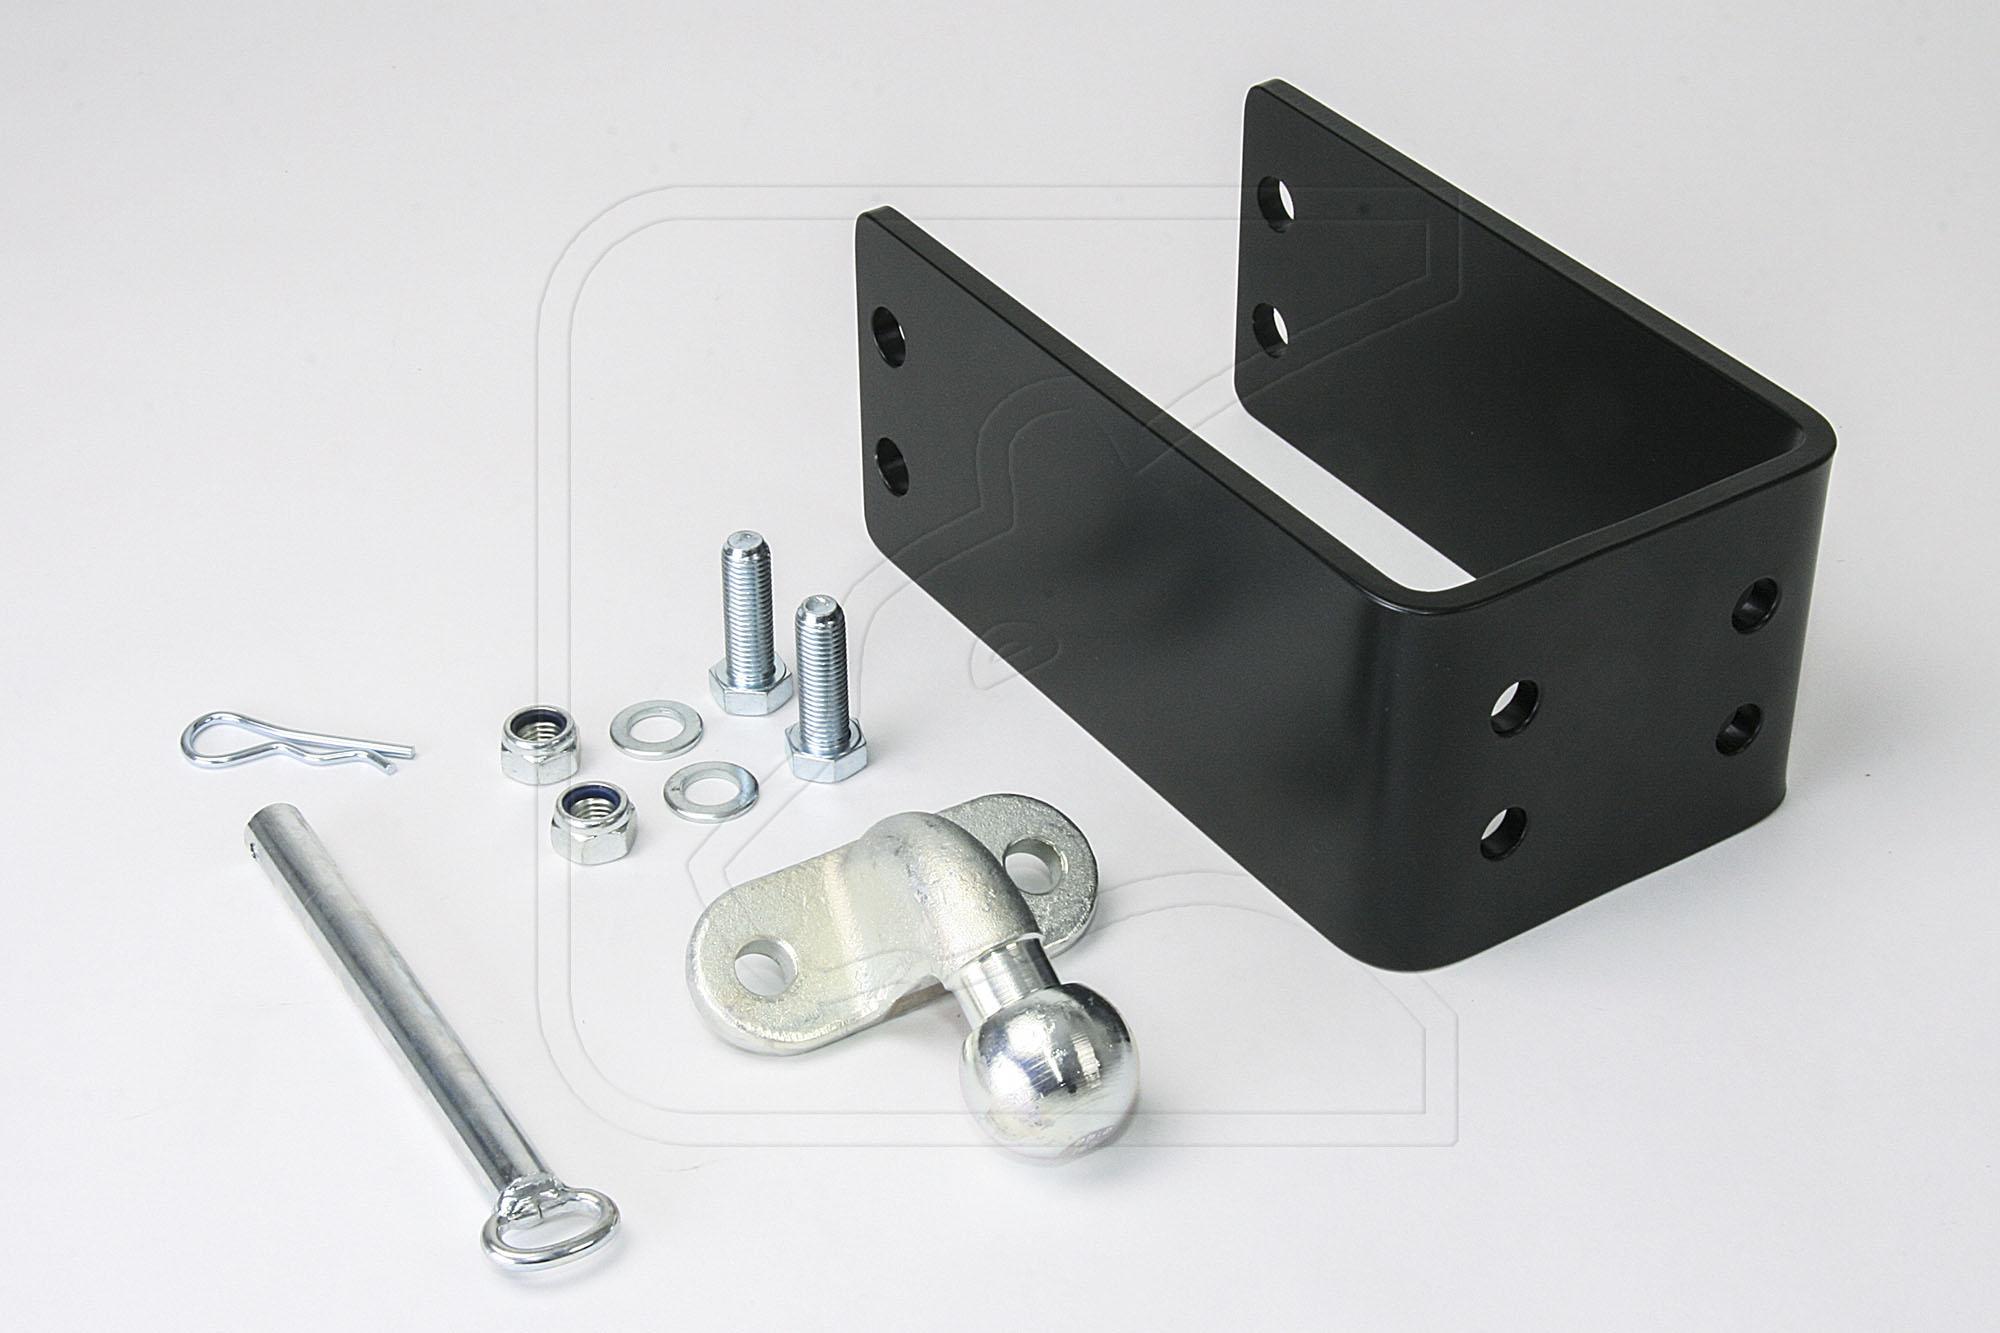 adapter f r fahrradtr ger an dixon bate kupplung. Black Bedroom Furniture Sets. Home Design Ideas